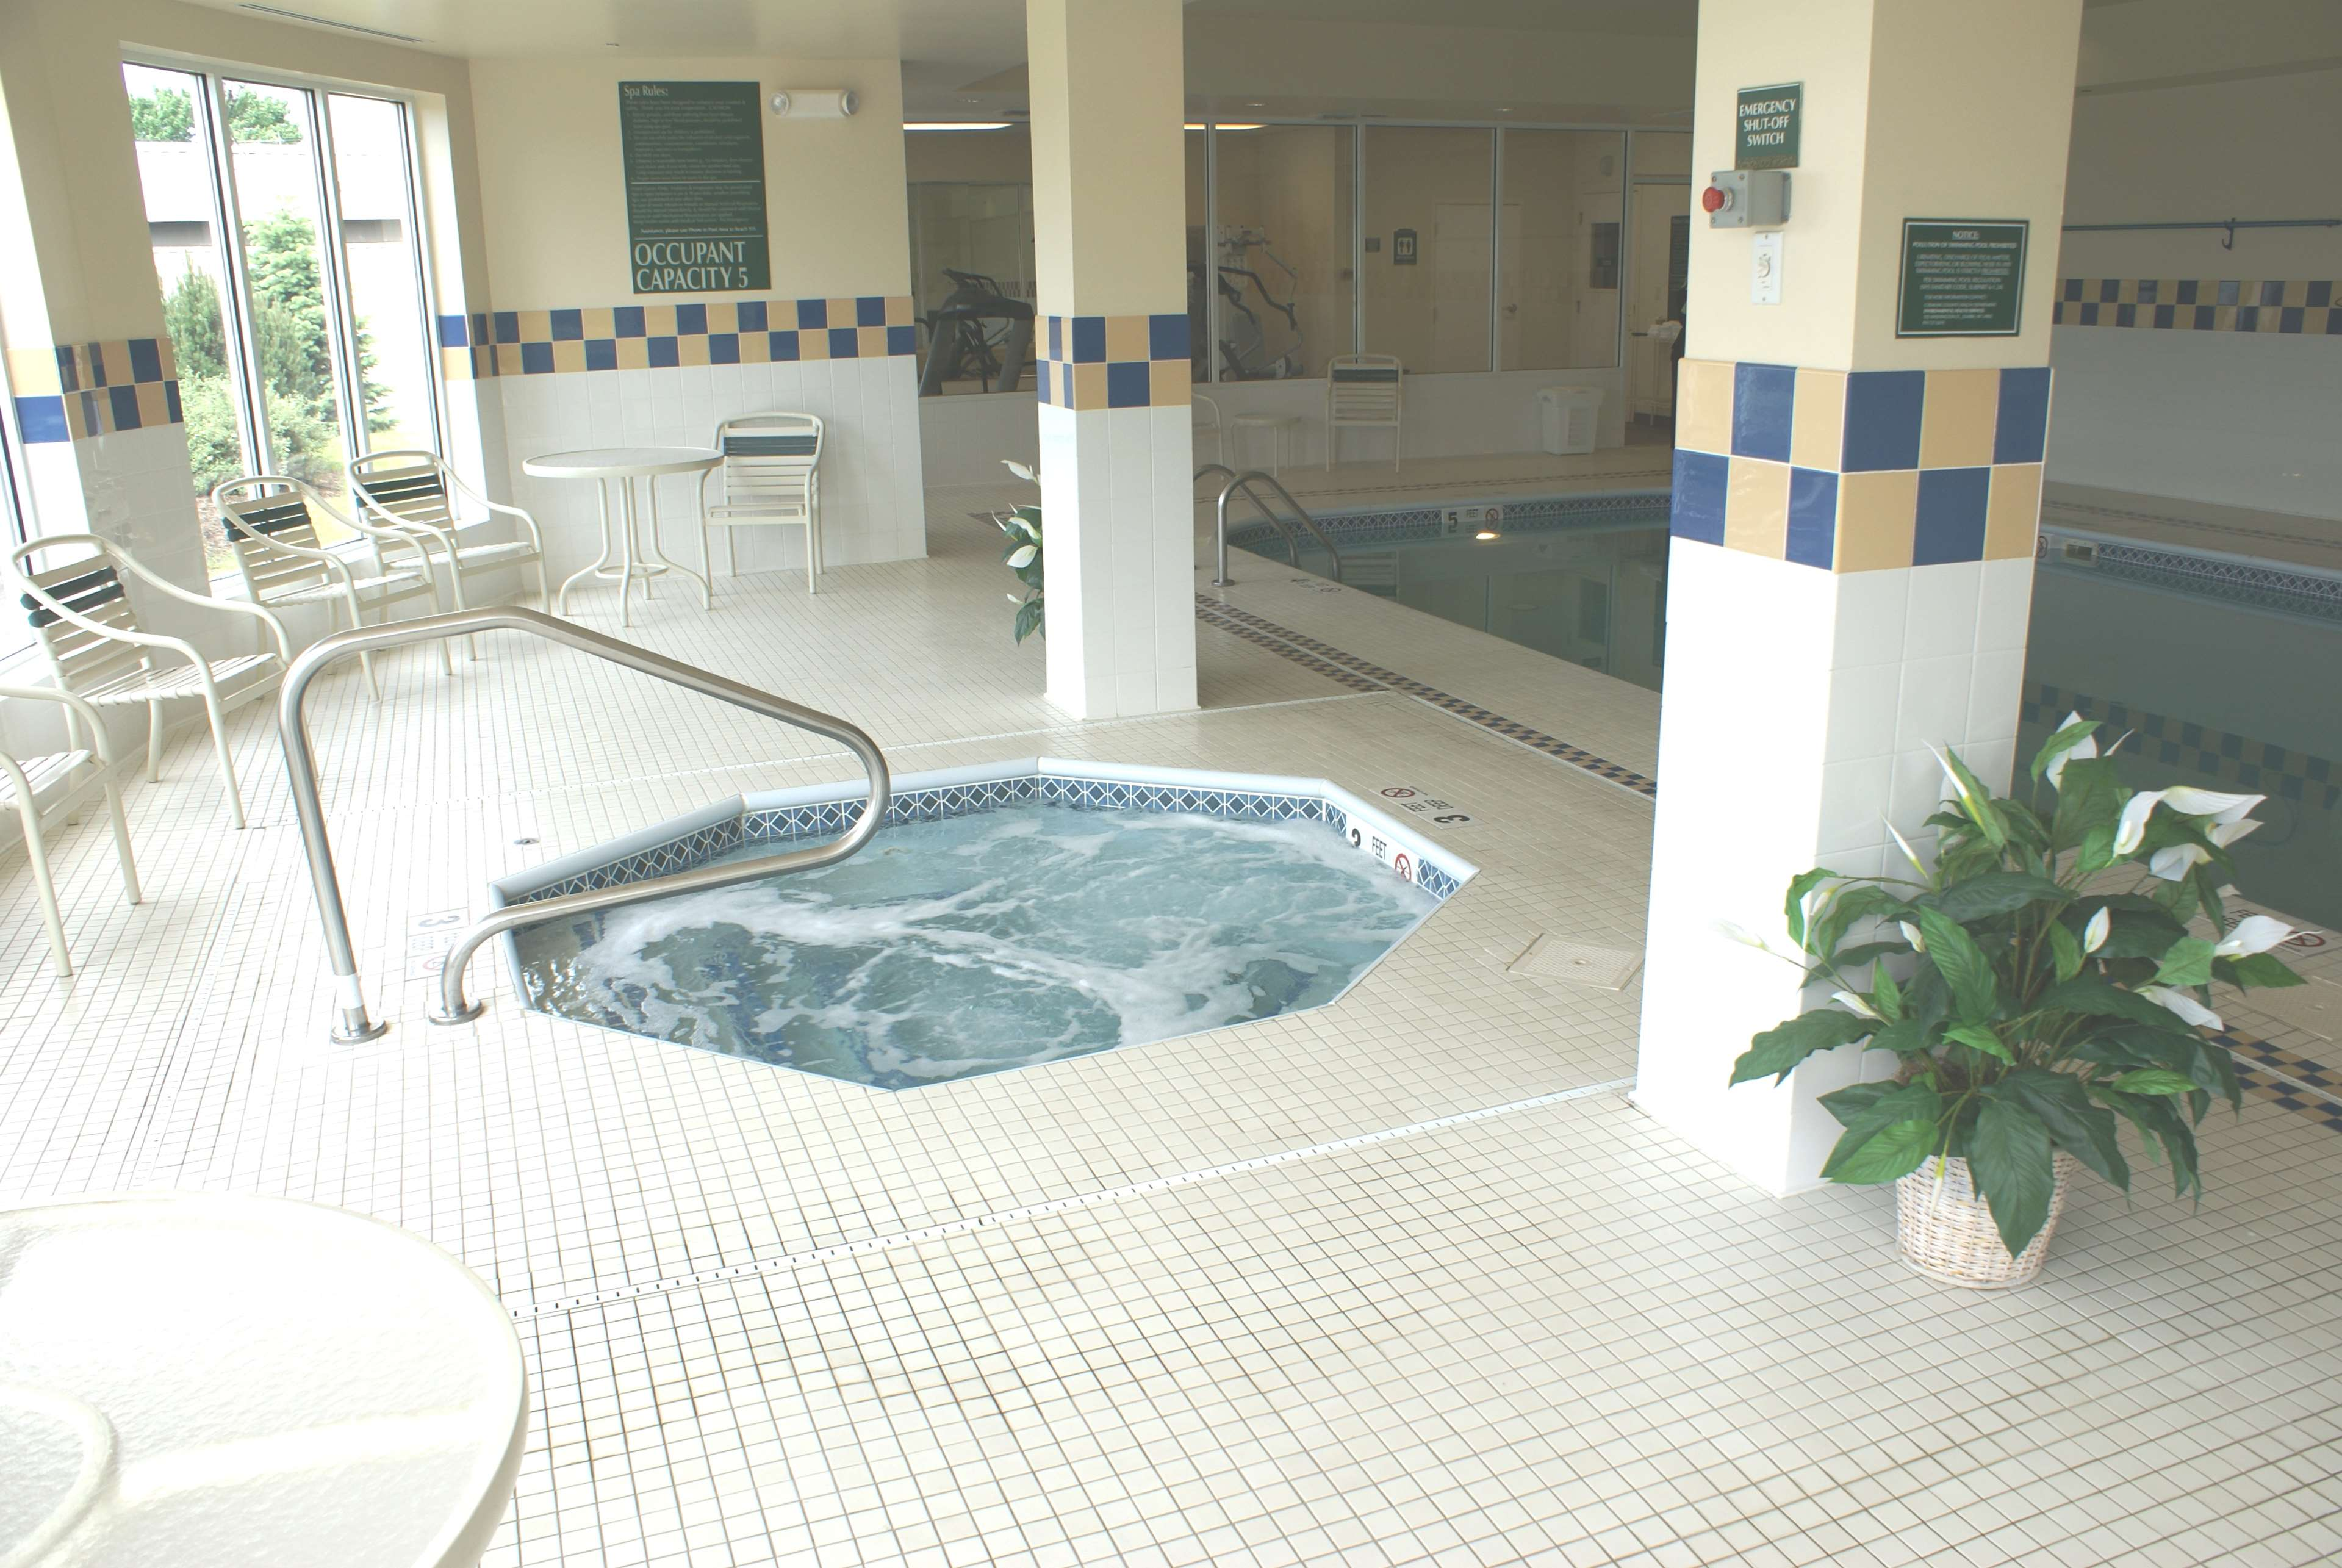 Hilton Garden Inn Elmira/Corning image 11